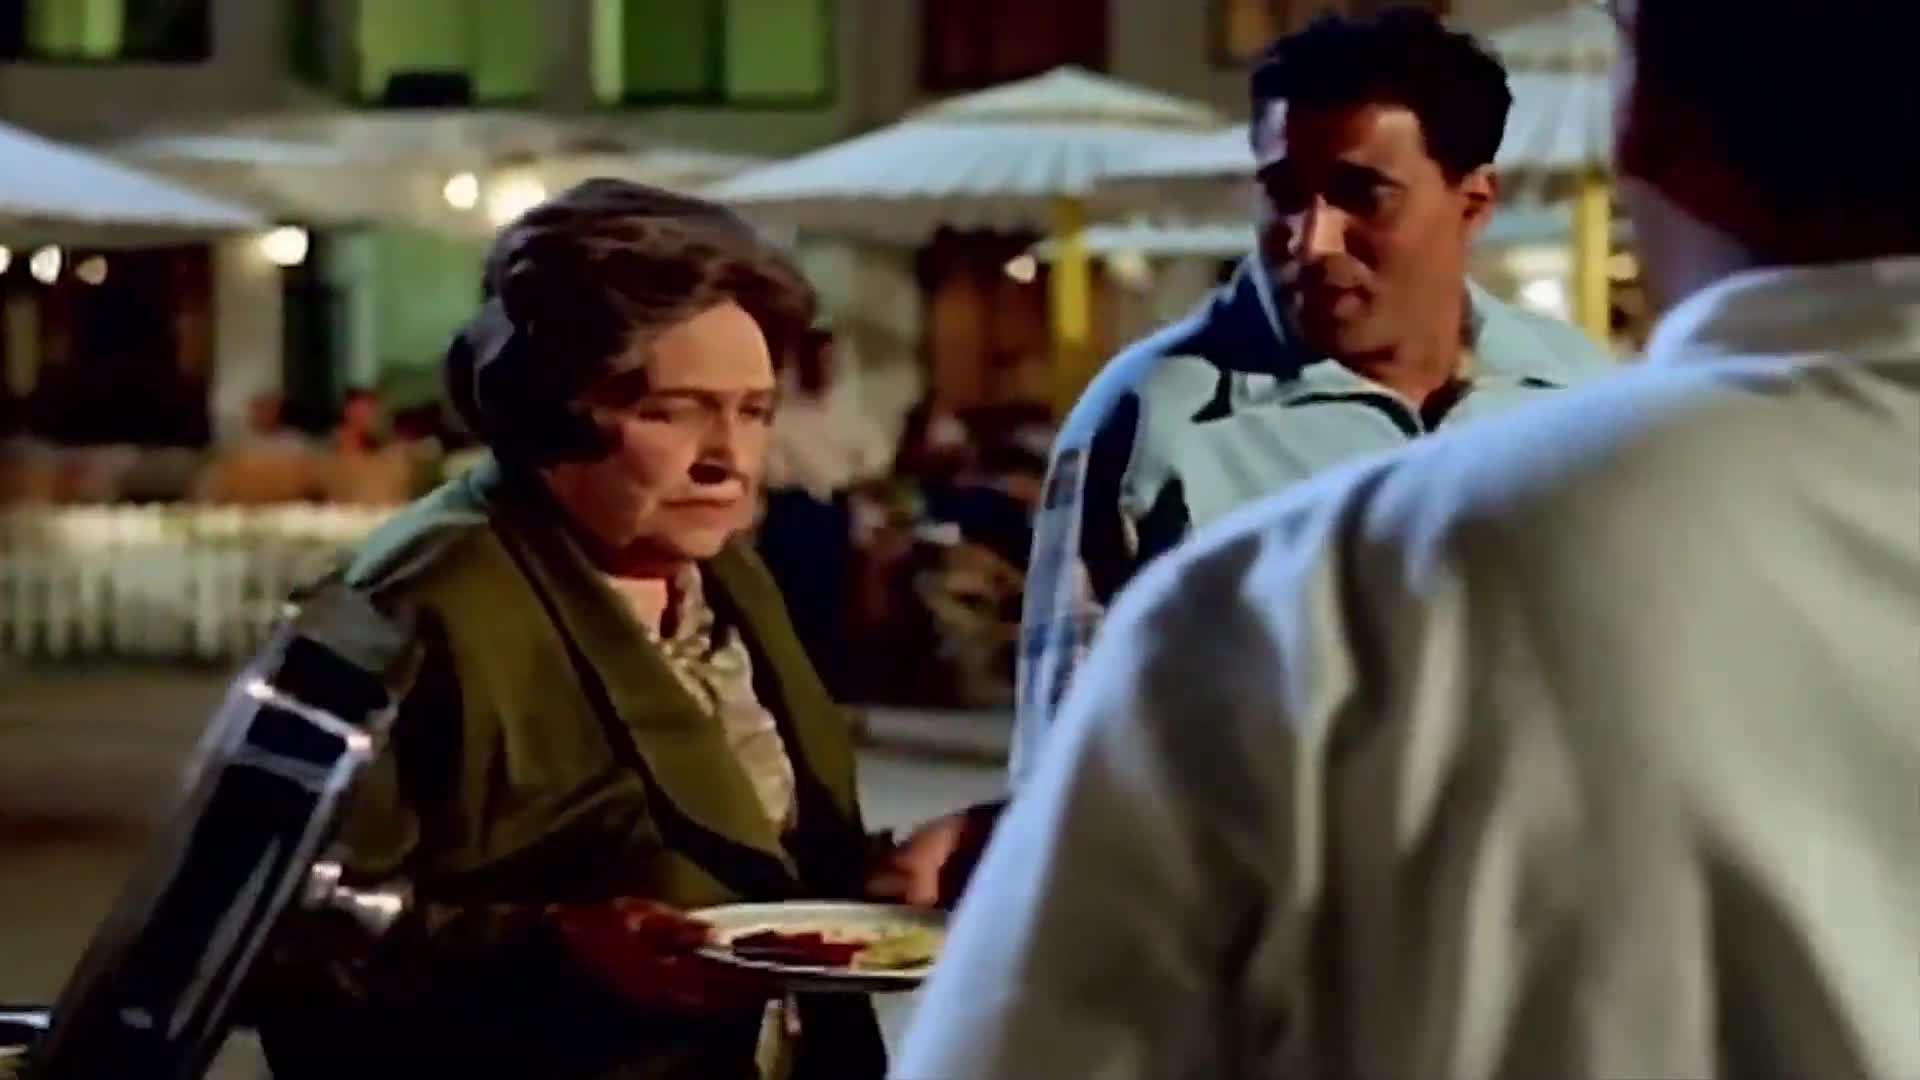 [فيلم][تورنت][تحميل][استاكوزا][1996][1080p][Web-DL] 18 arabp2p.com